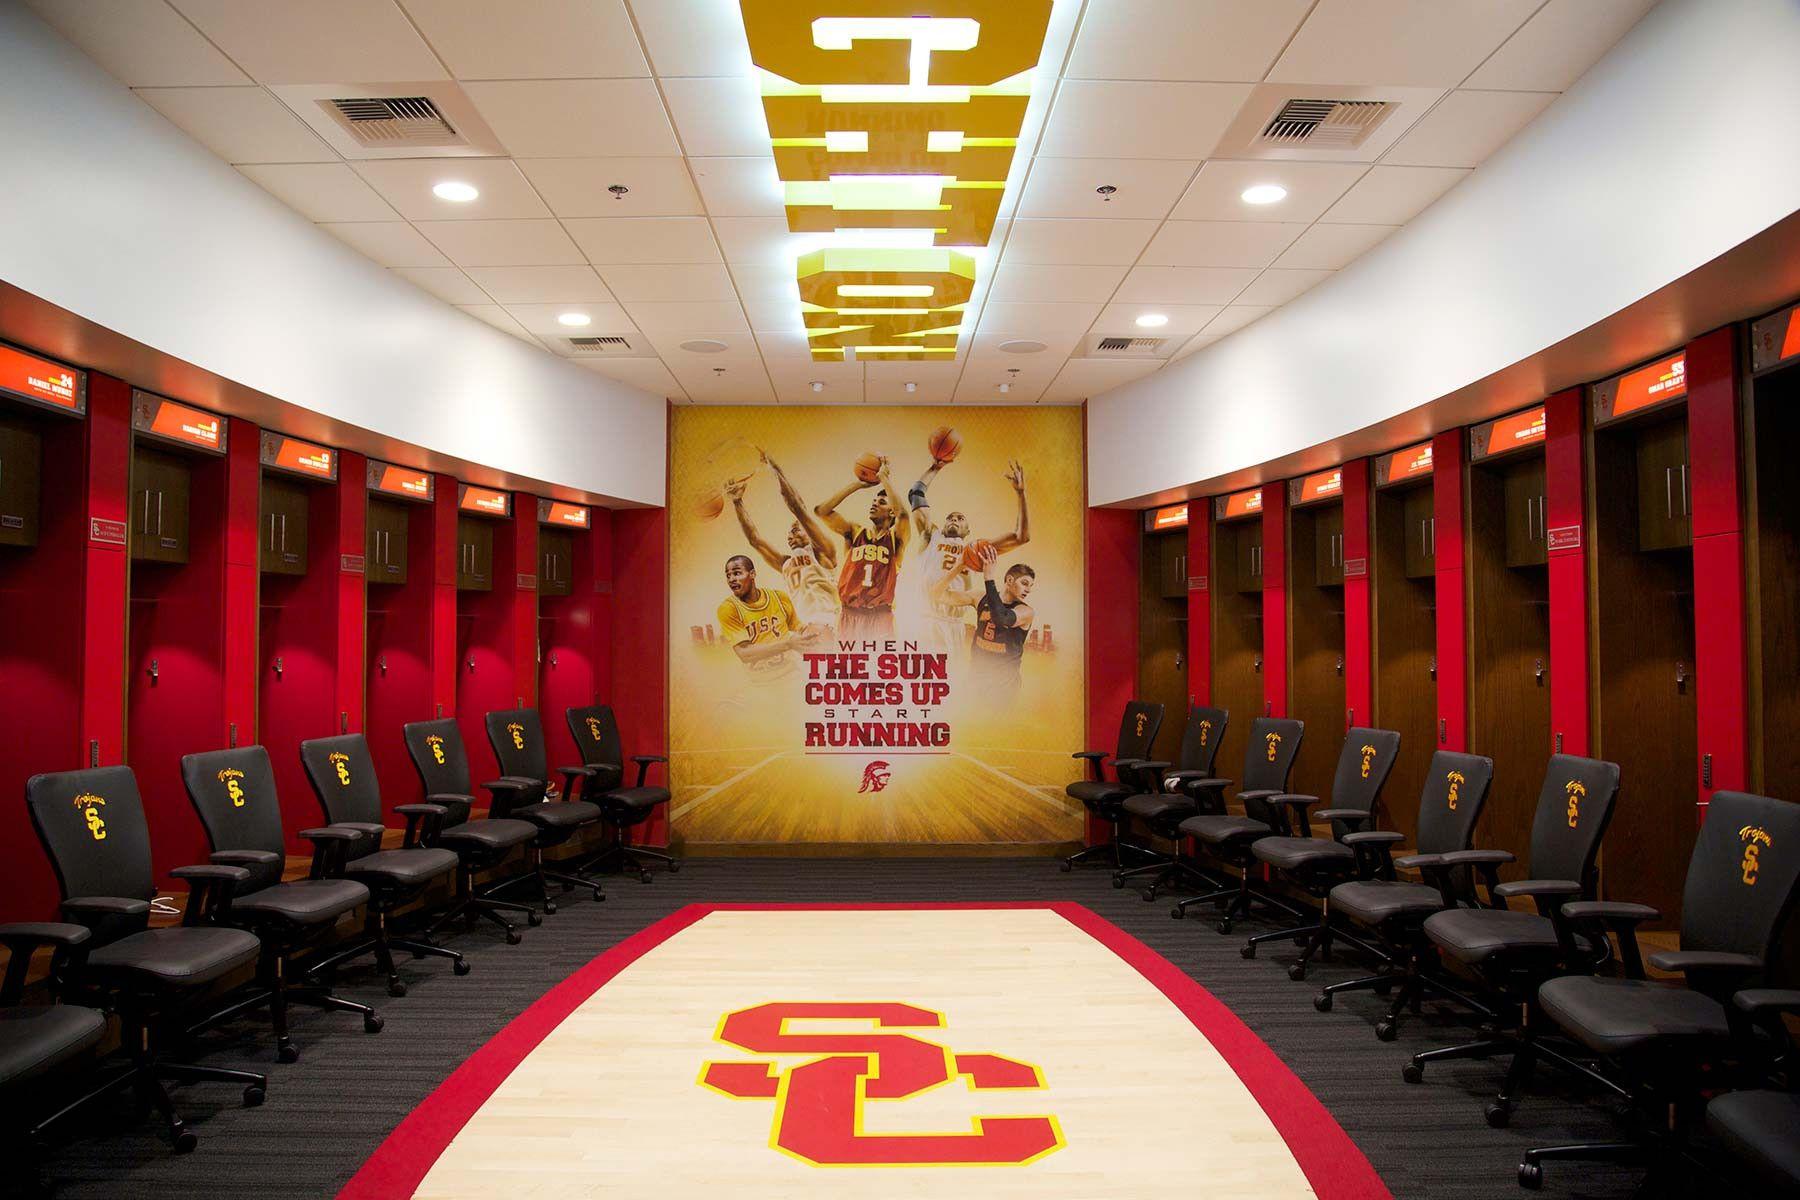 Pin By G U I B S O N On Dhs Basketball Locker Room Lockers University Of Southern California